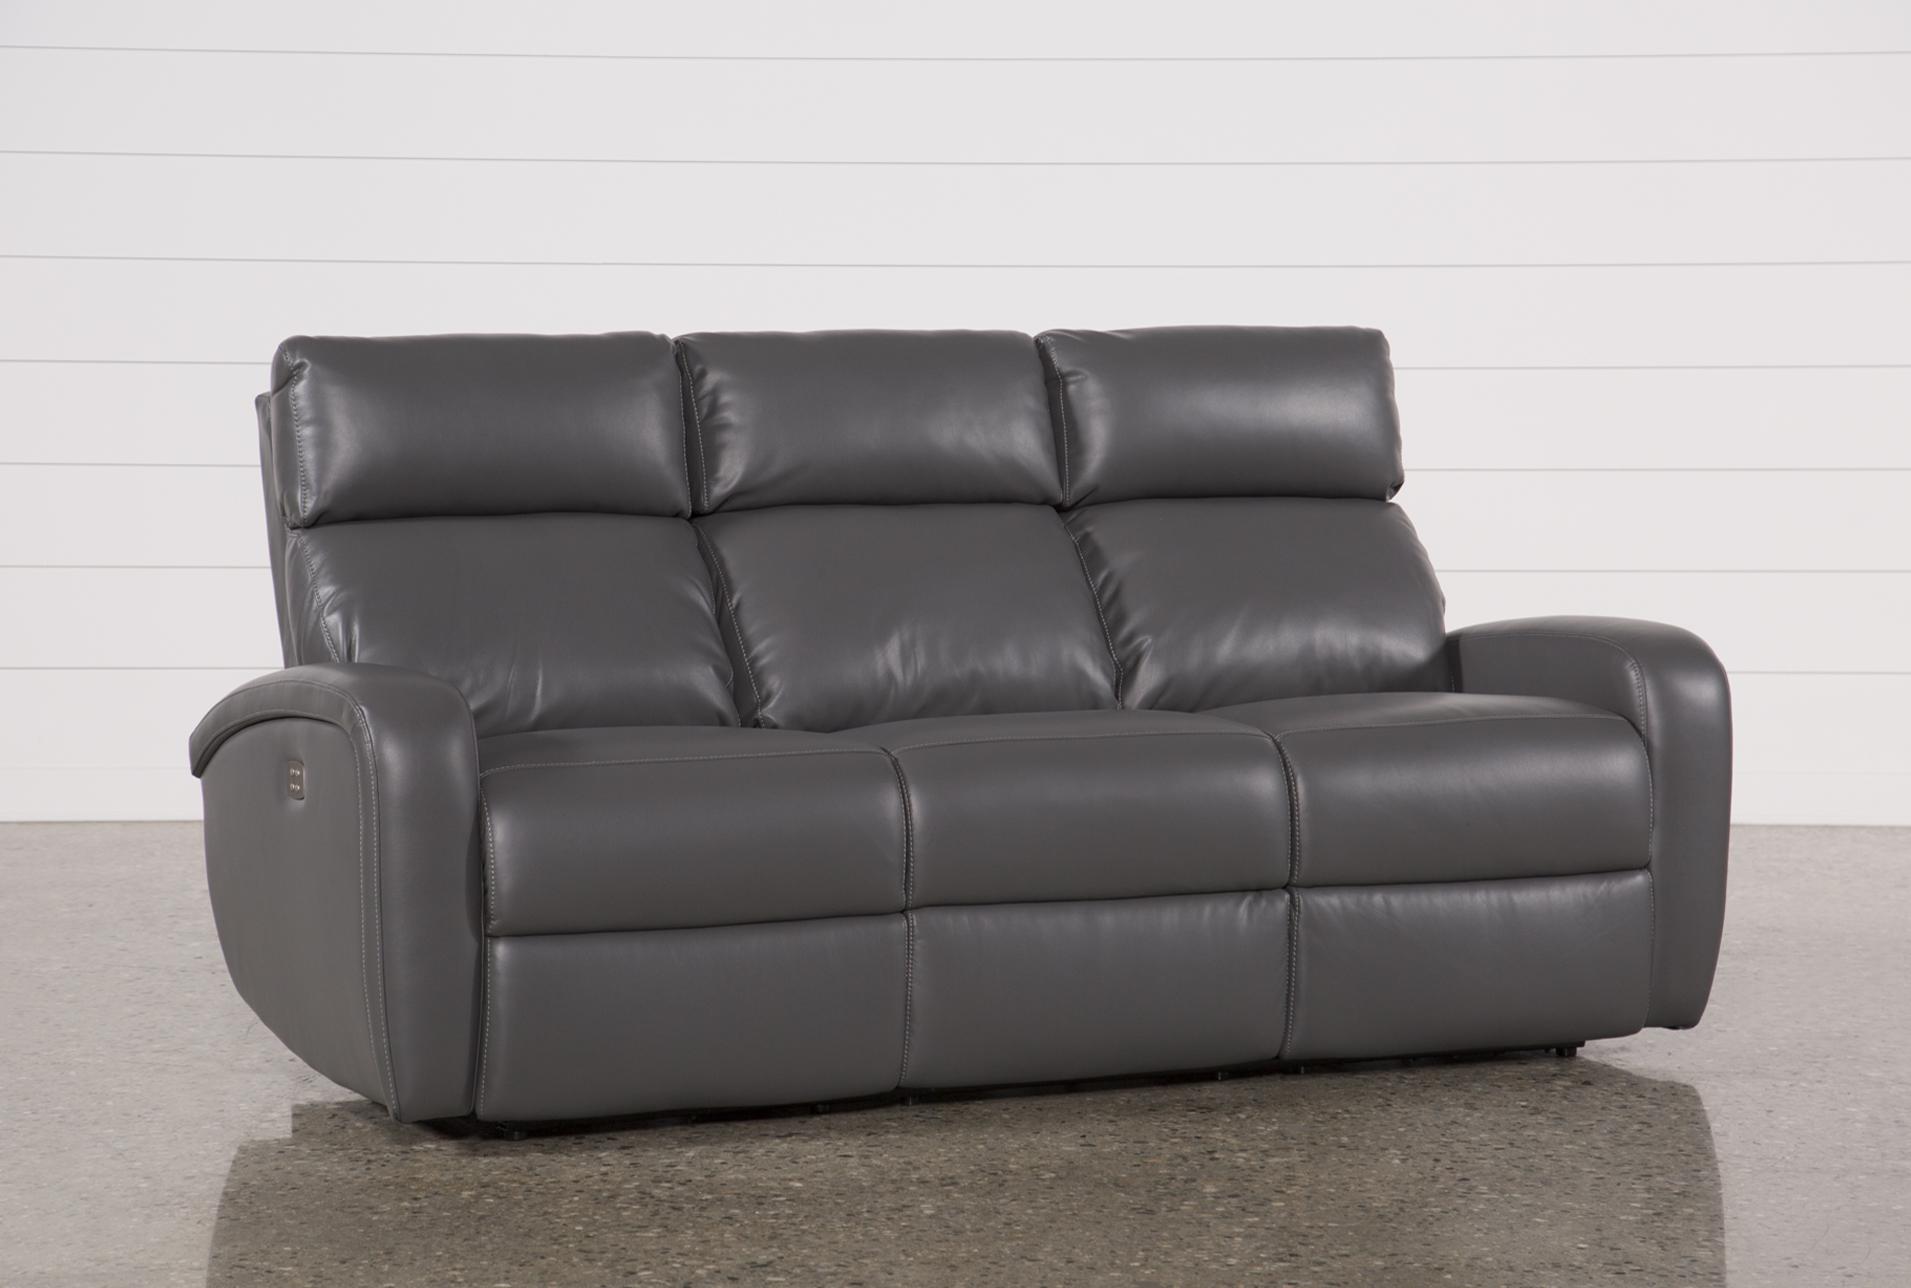 Darwin Graphite Power Reclining Sofa